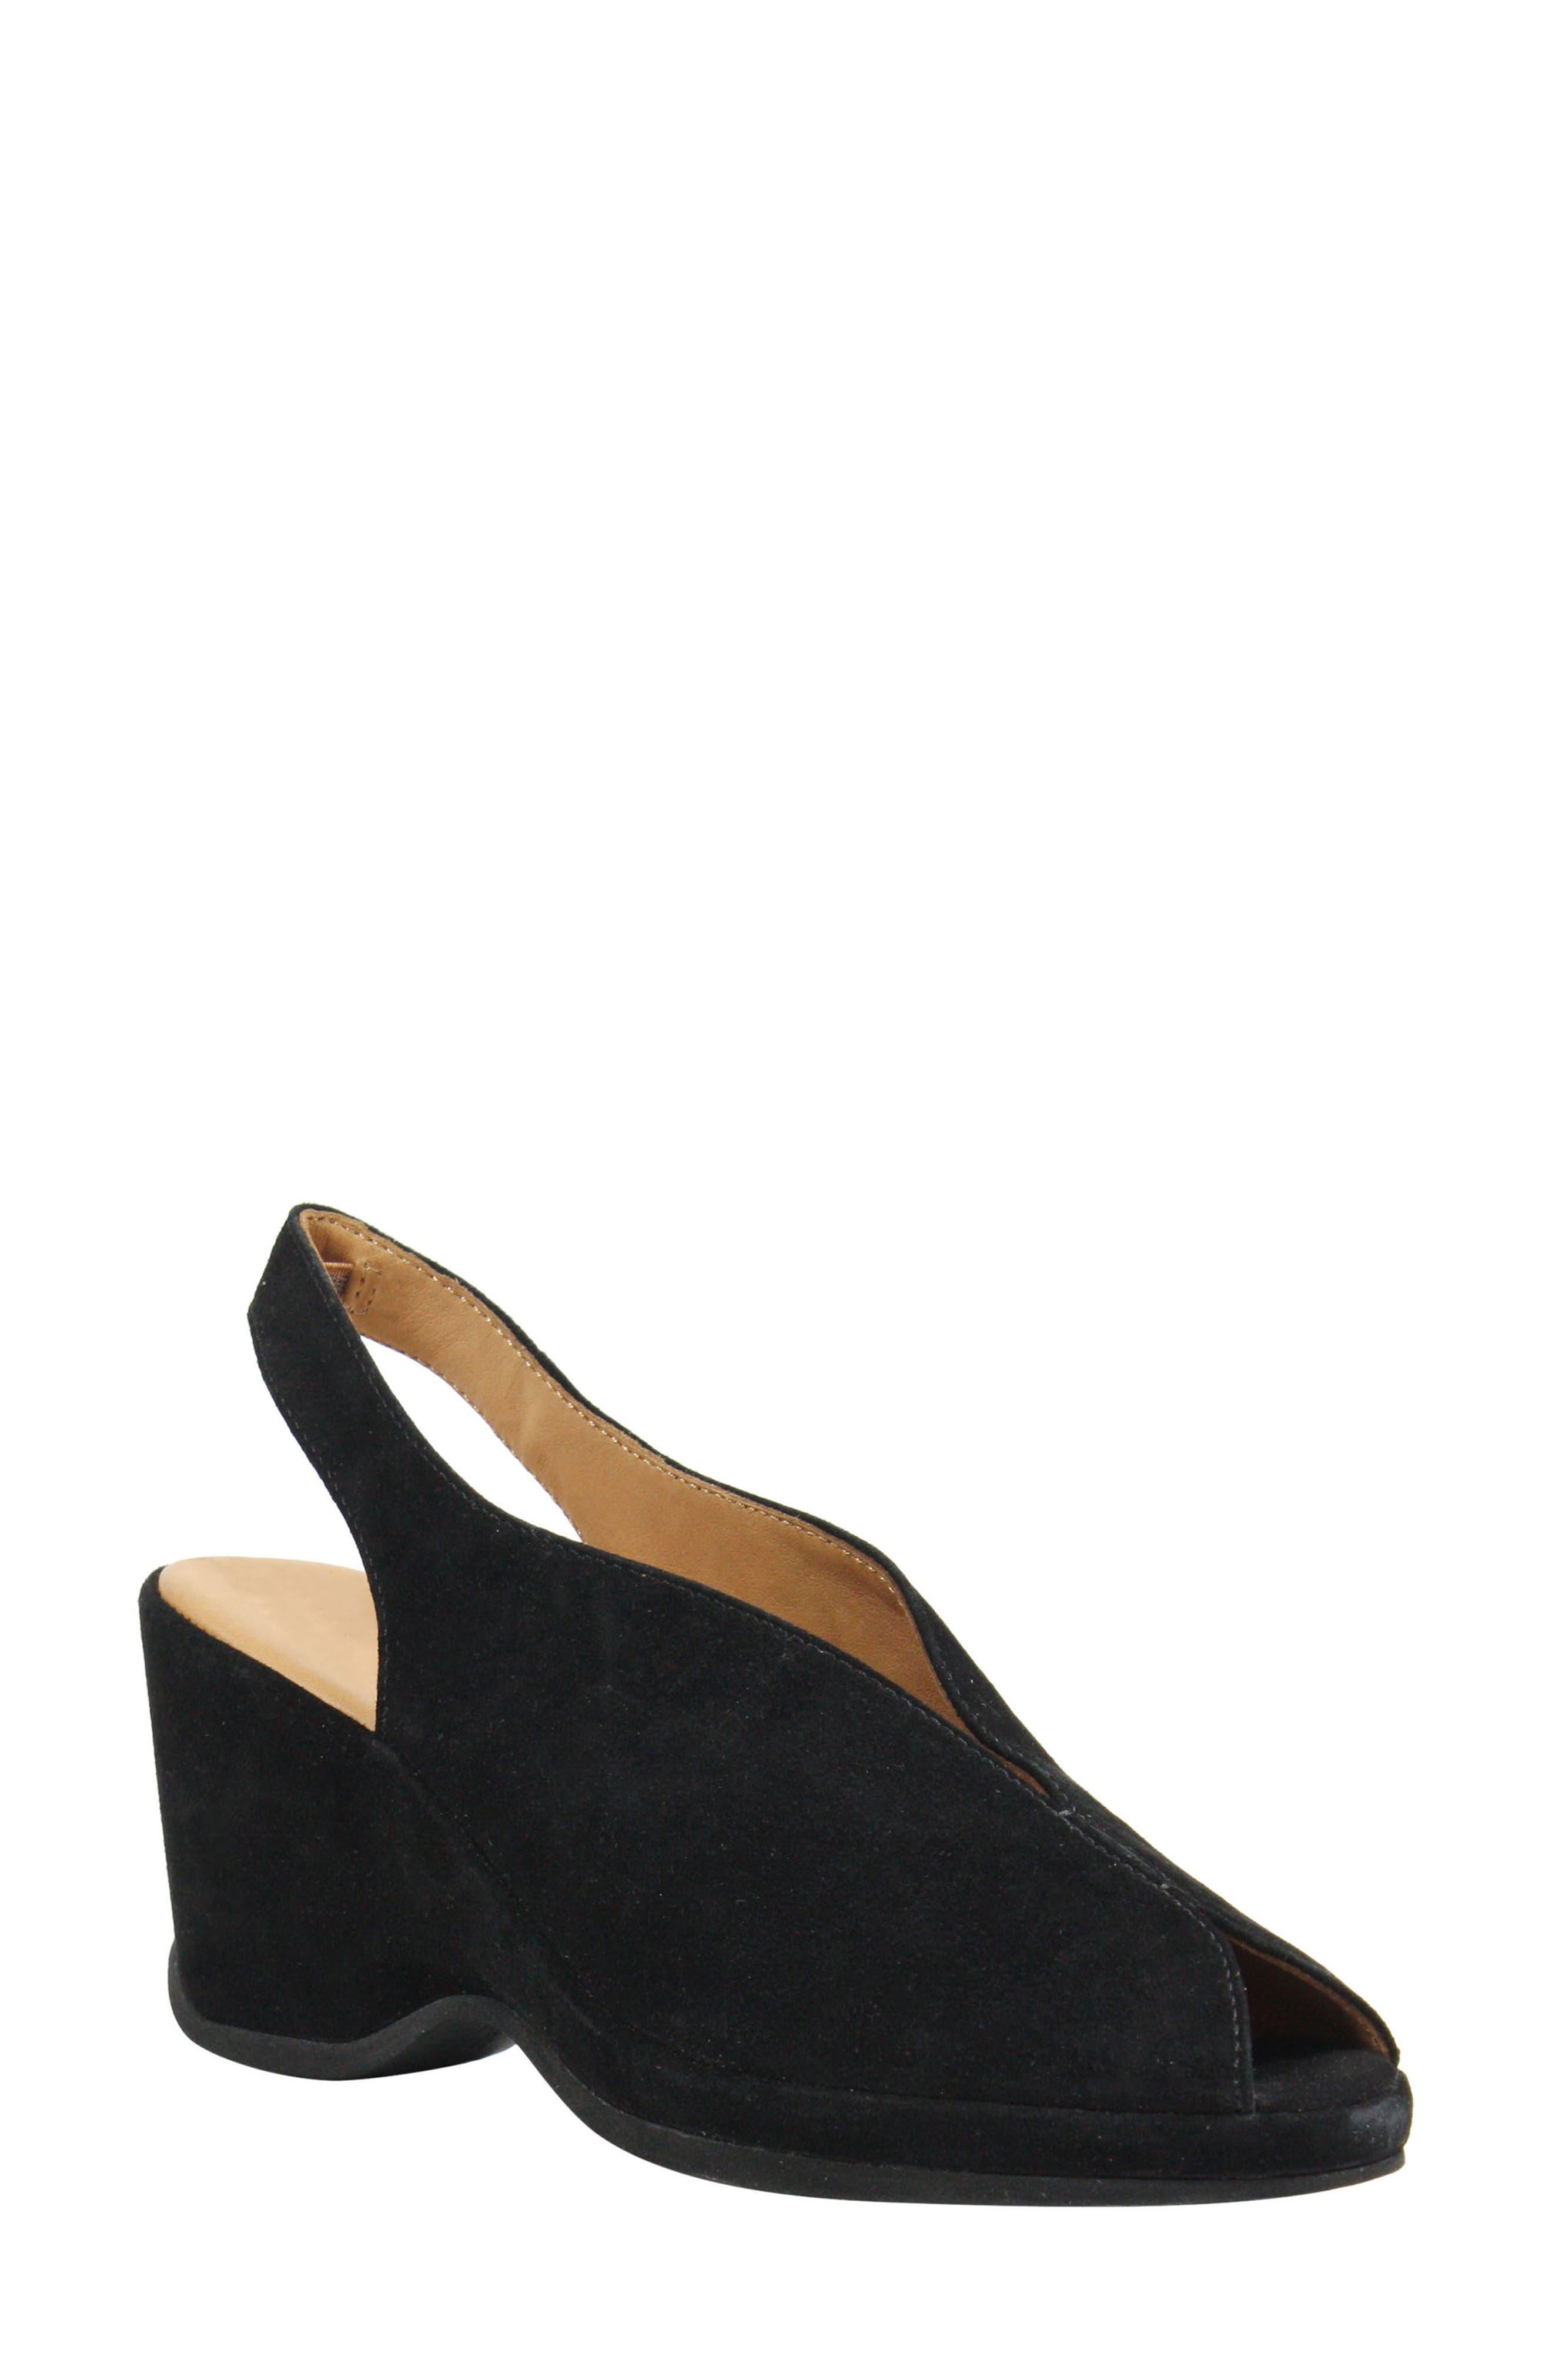 L'AMOUR DES PIEDS, Odetta Slingback Wedge, Main thumbnail 1, color, BLACK SUEDE